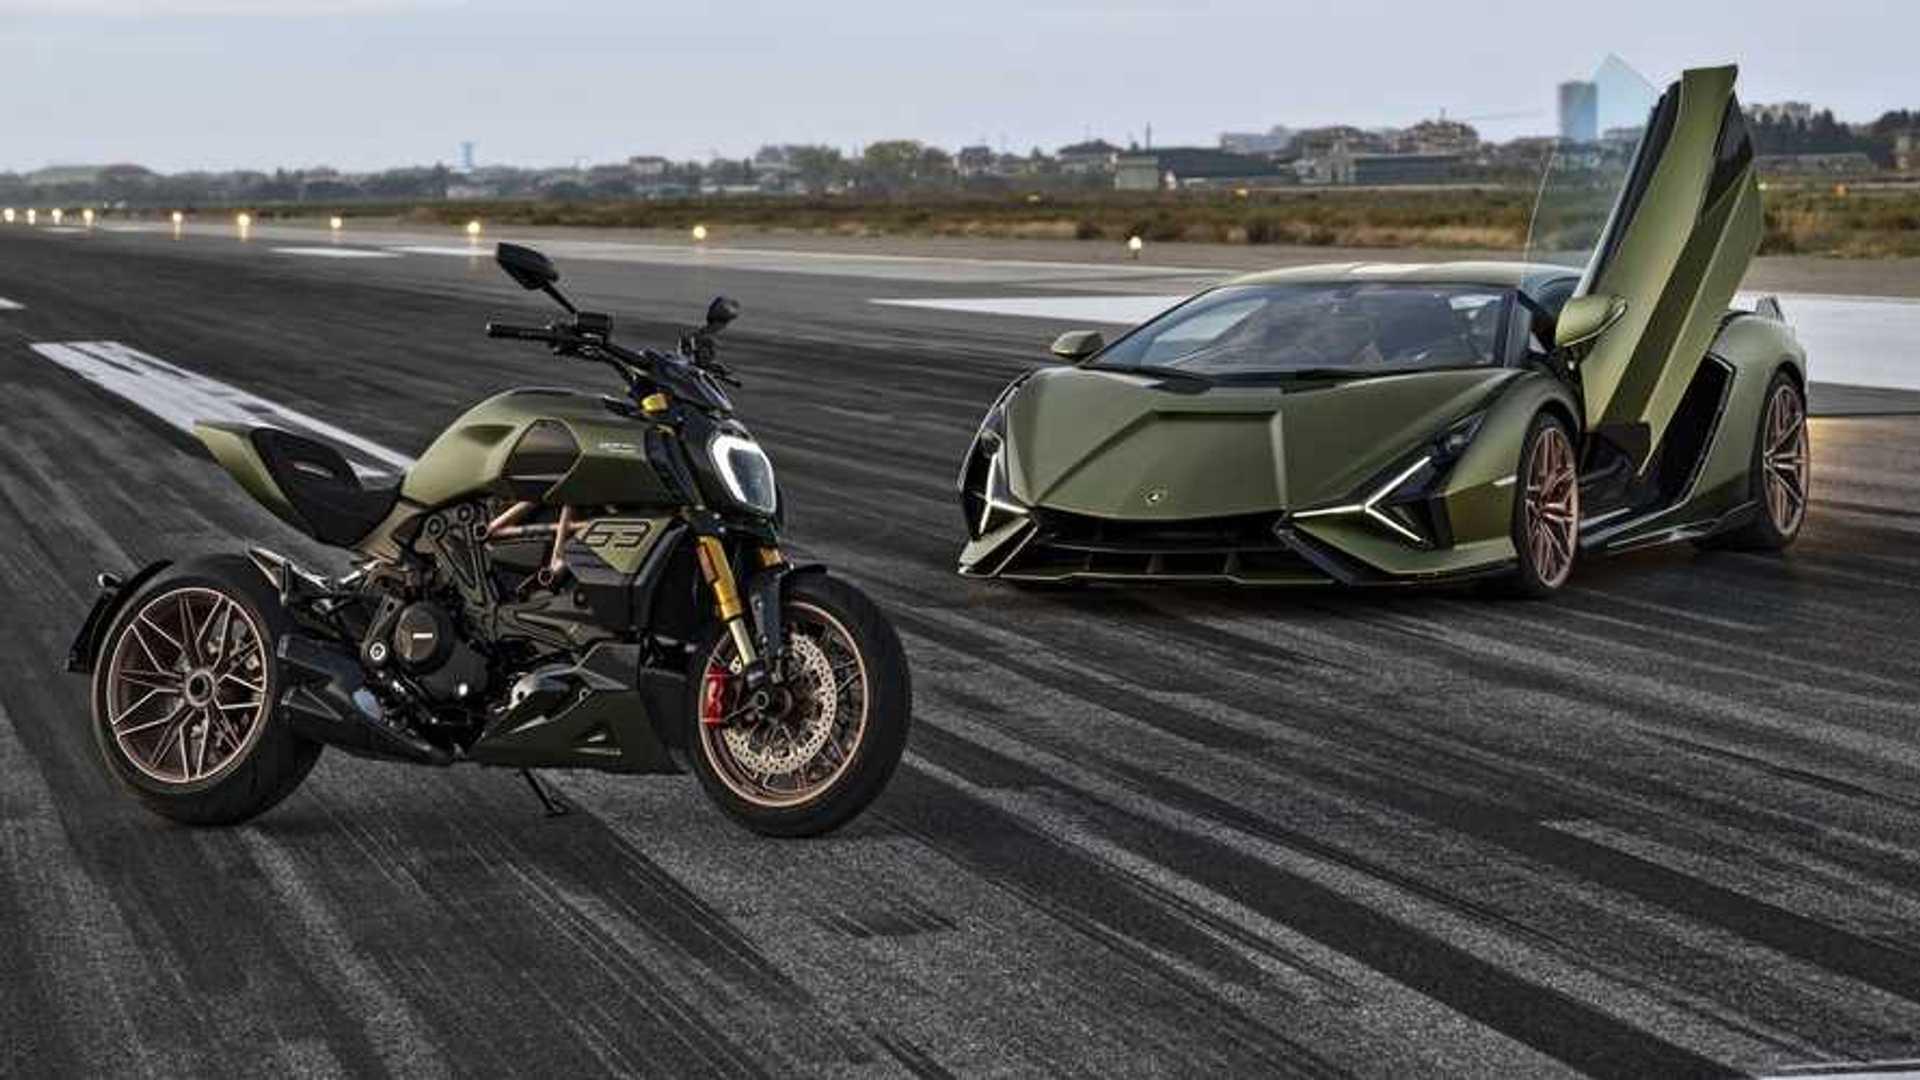 Ducati Diavel 1260 Lamborghini: DNA Motor Valley